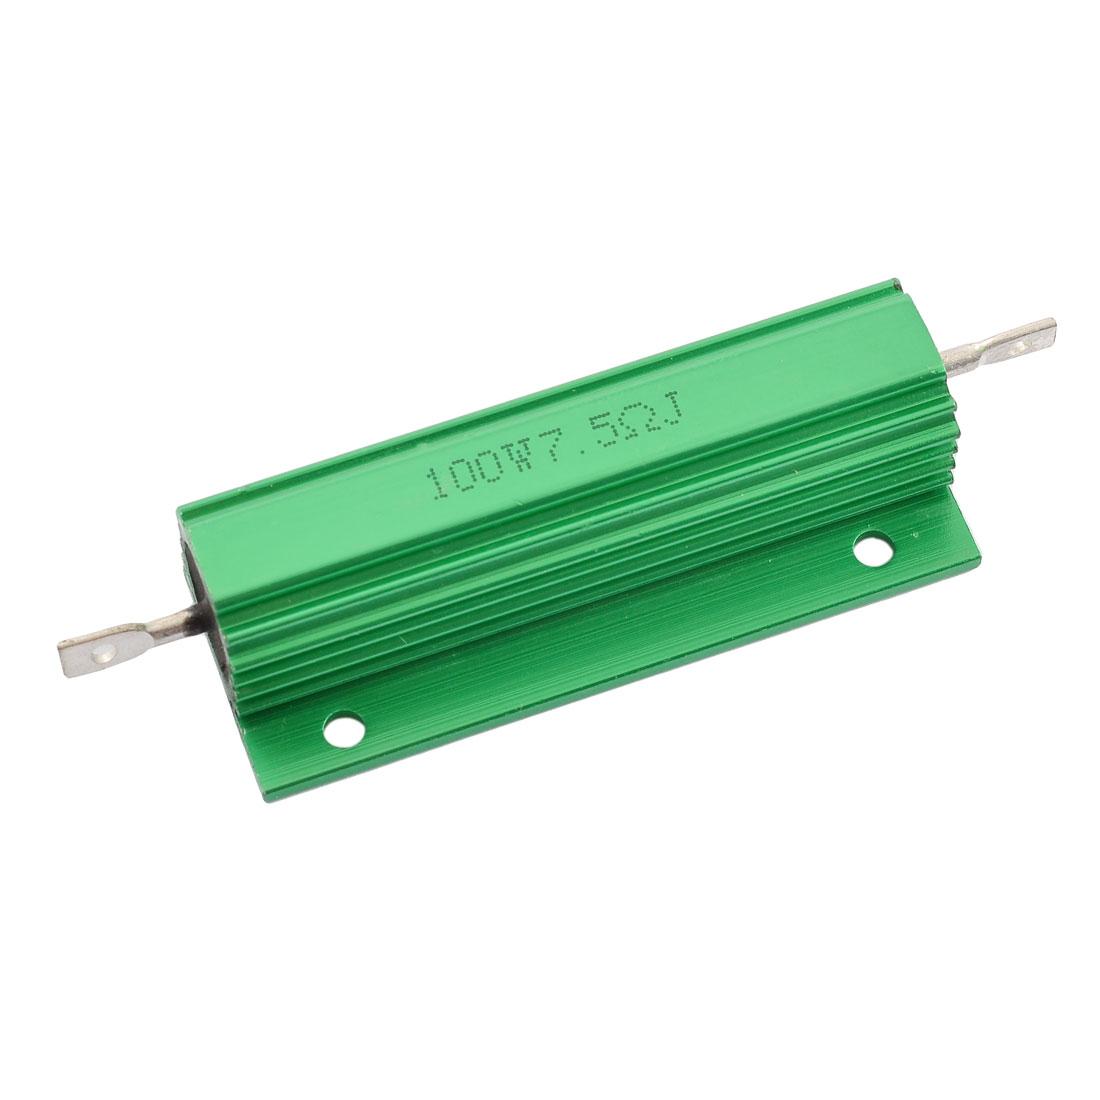 Chassis Mounted 100W Watt 7.5 Ohm Wirewound Power Resistor